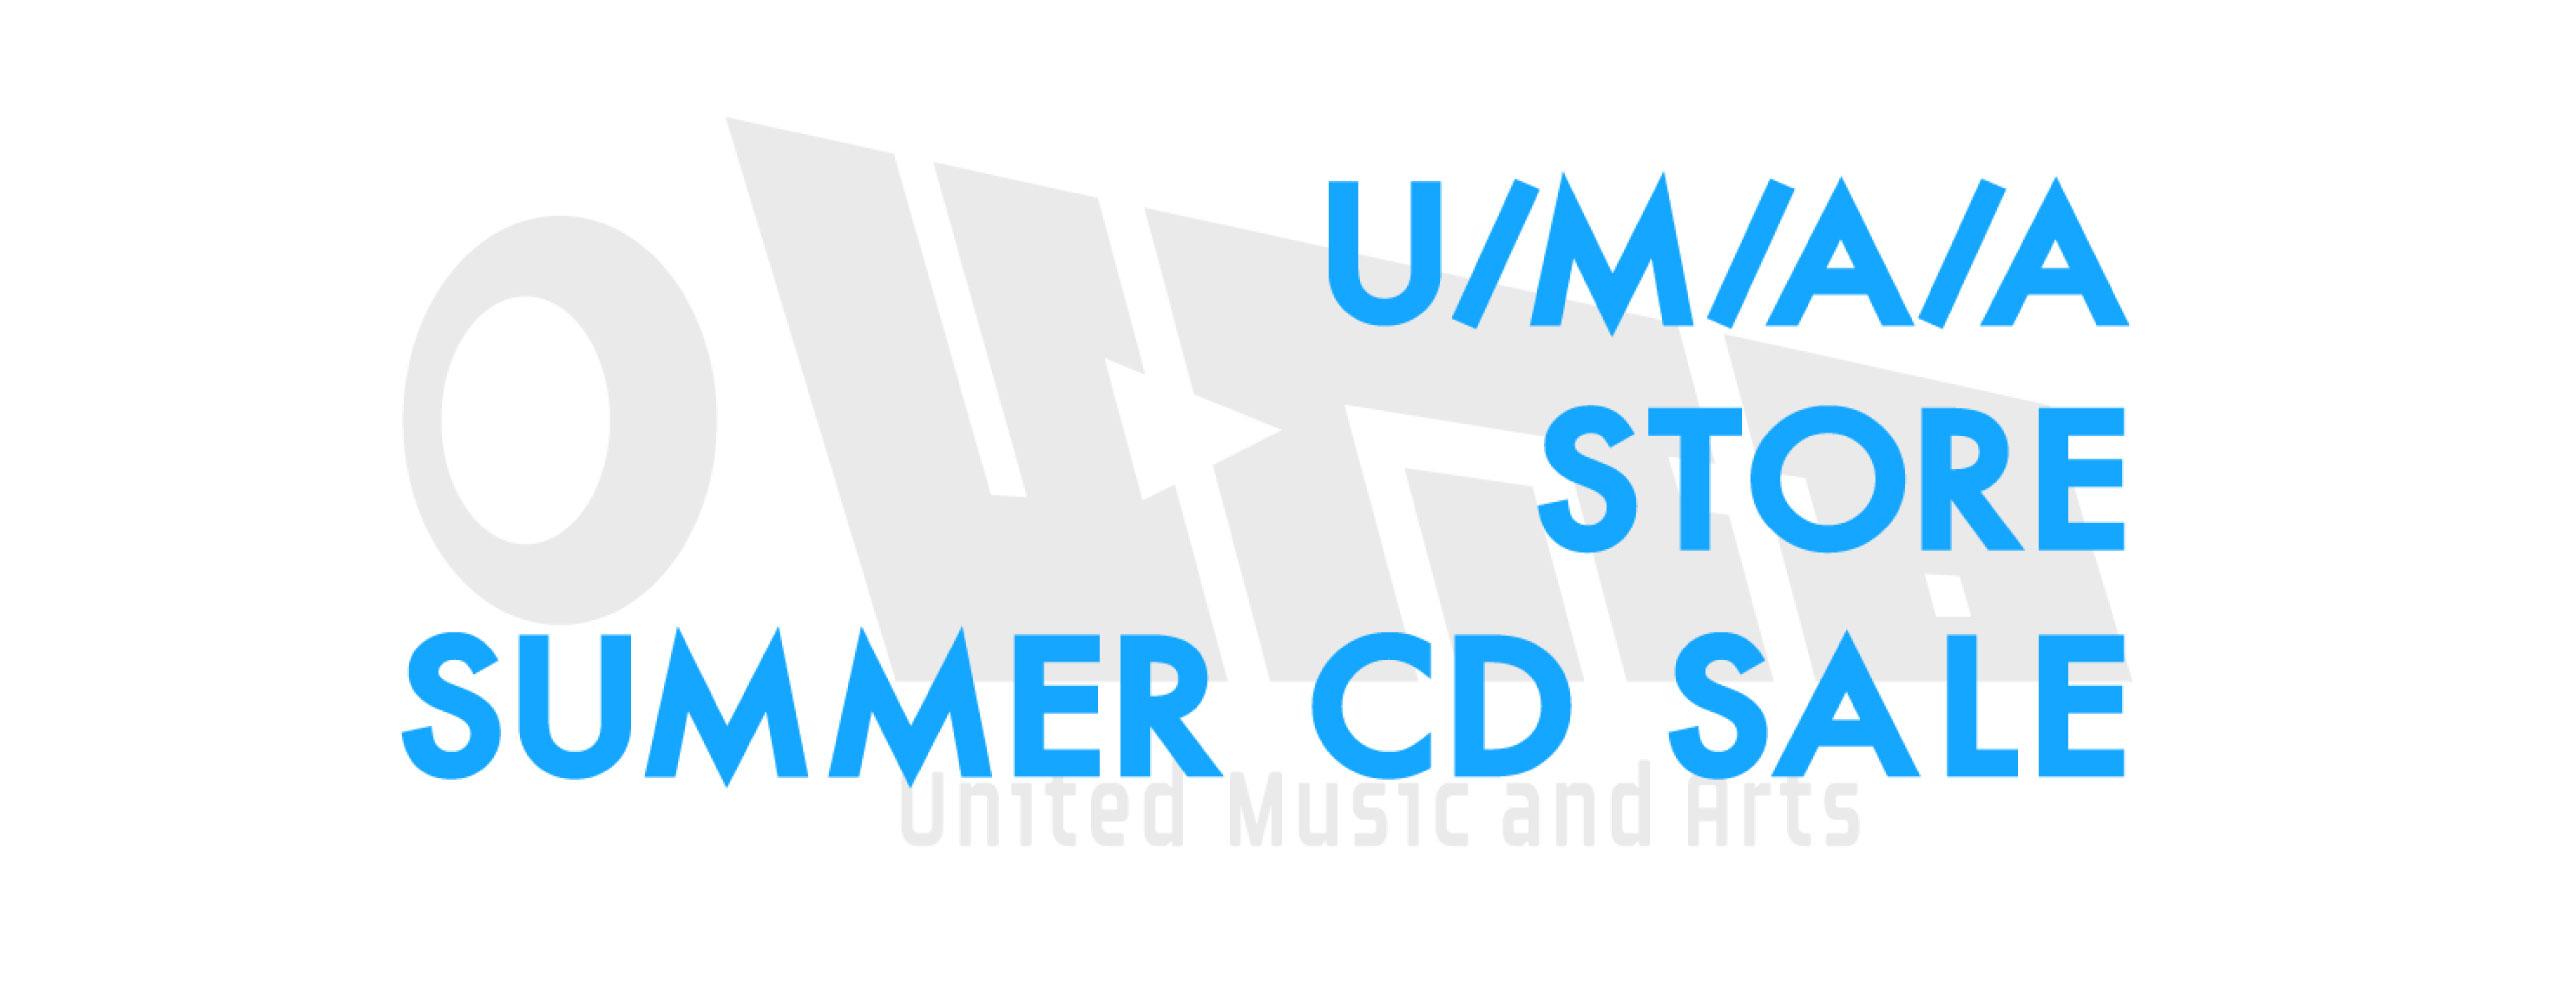 【7/8〜7/29】SUMMER CD SALE!